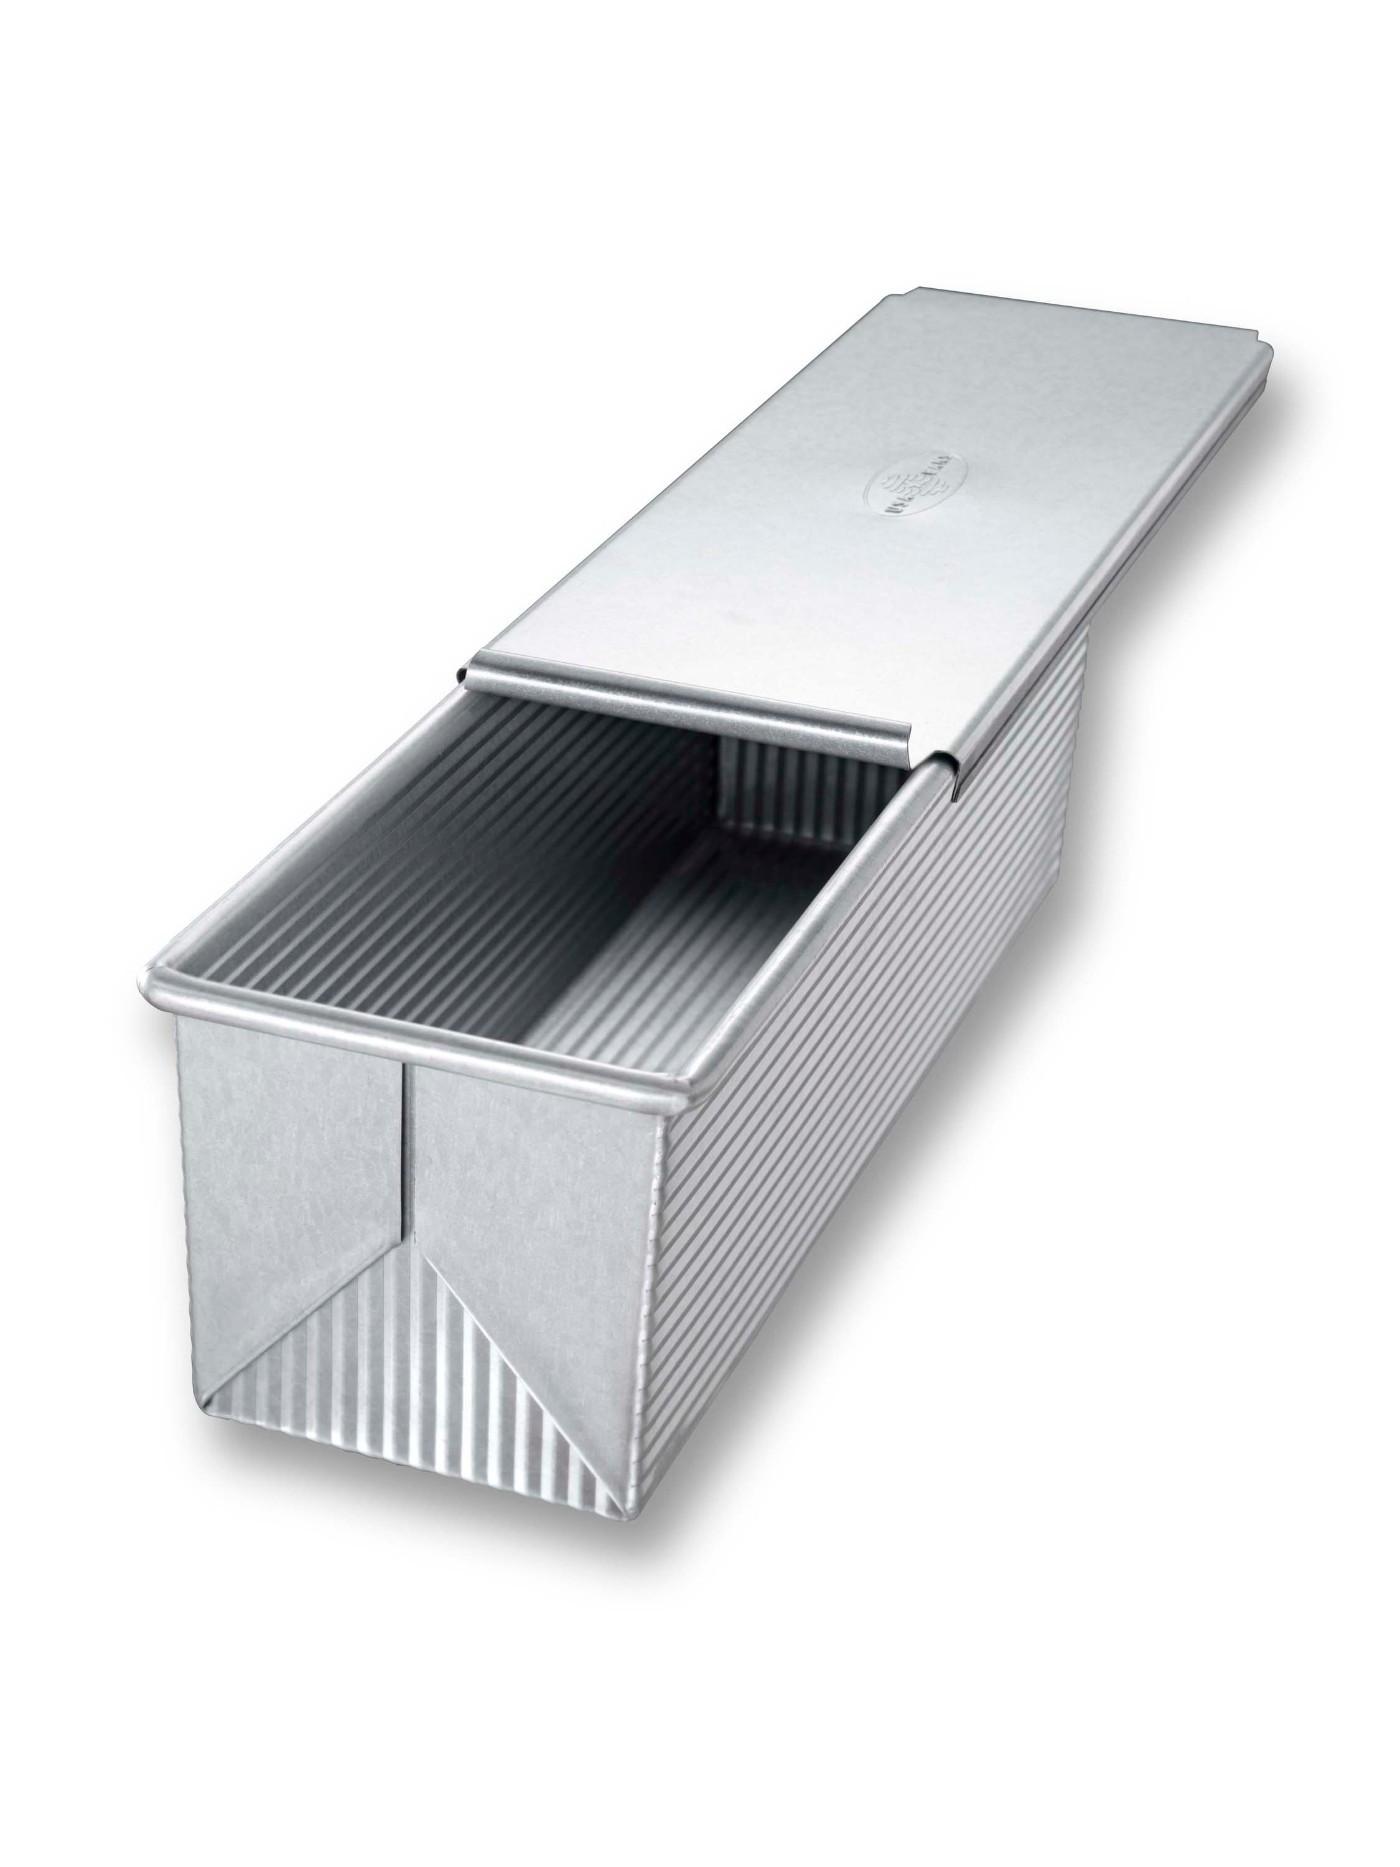 USA Pan Bakeware Aluminized Steel 9